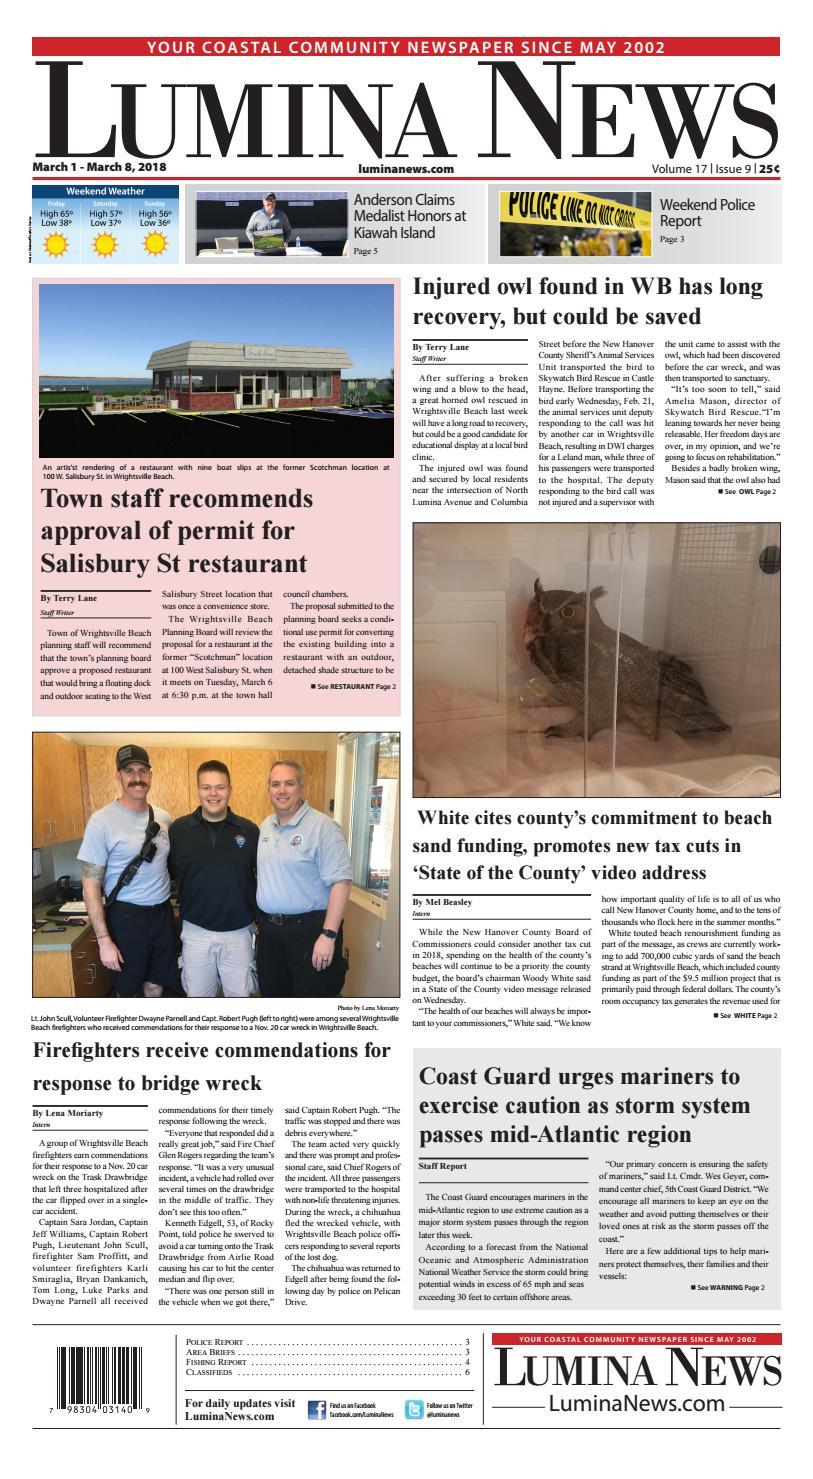 Lumina News March 1, 2018 by Lumina News - issuu